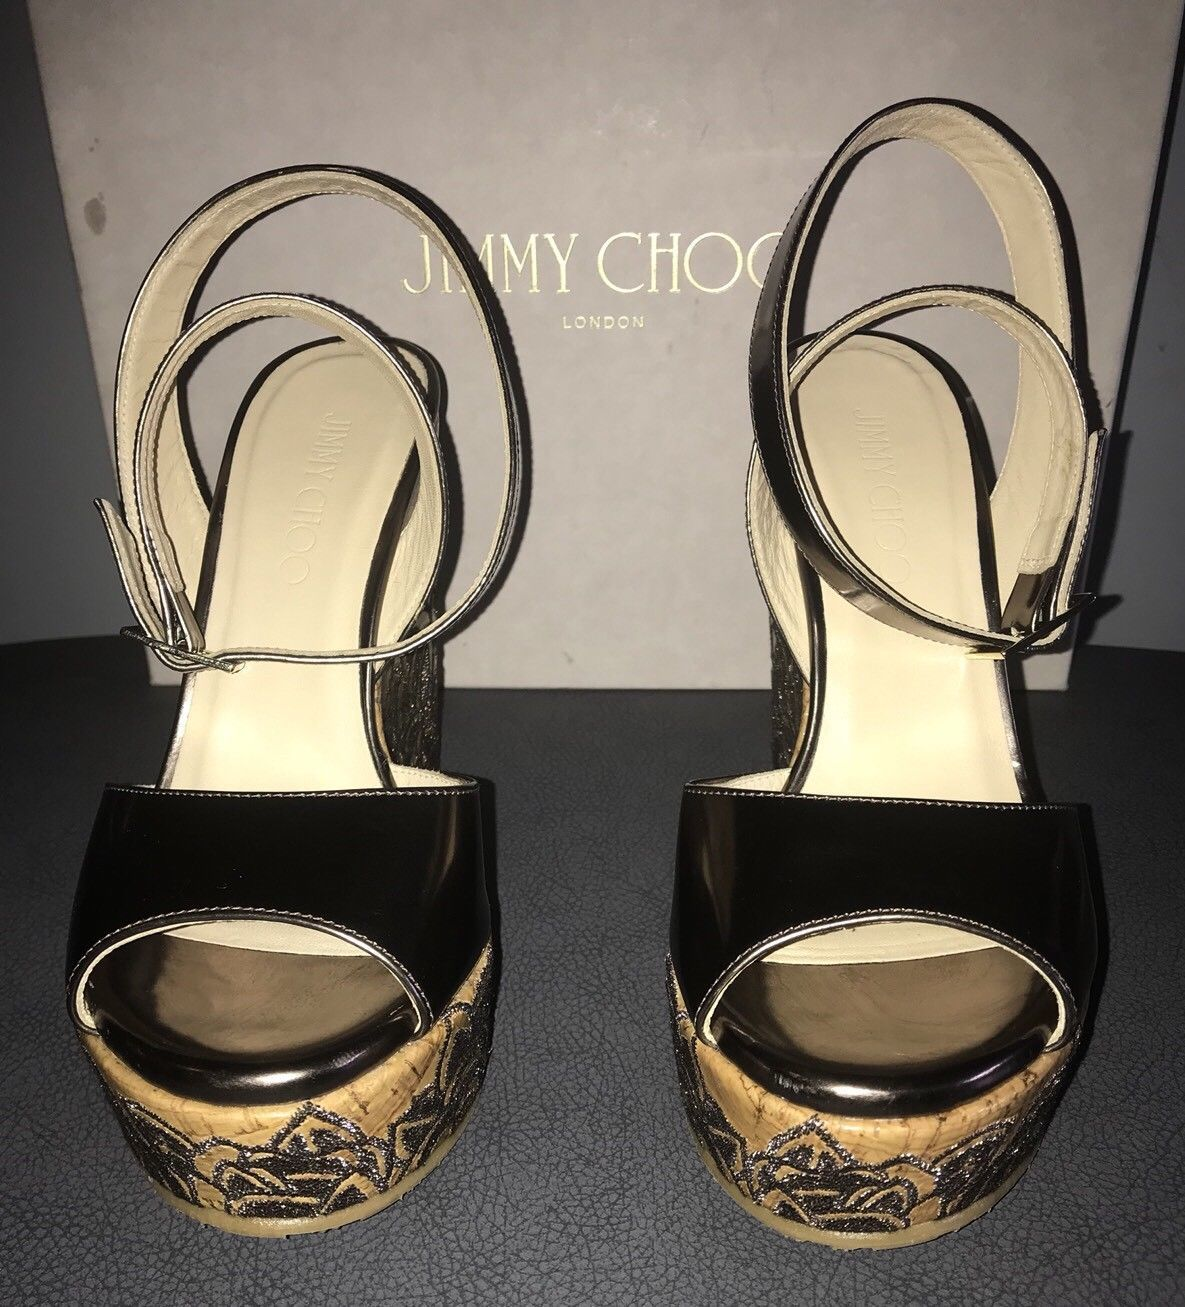 Authentic NIB JIMMY CHOO Patara Leather Cork Wedge Sandals Shoes-Sz:38.5EU/8.5US